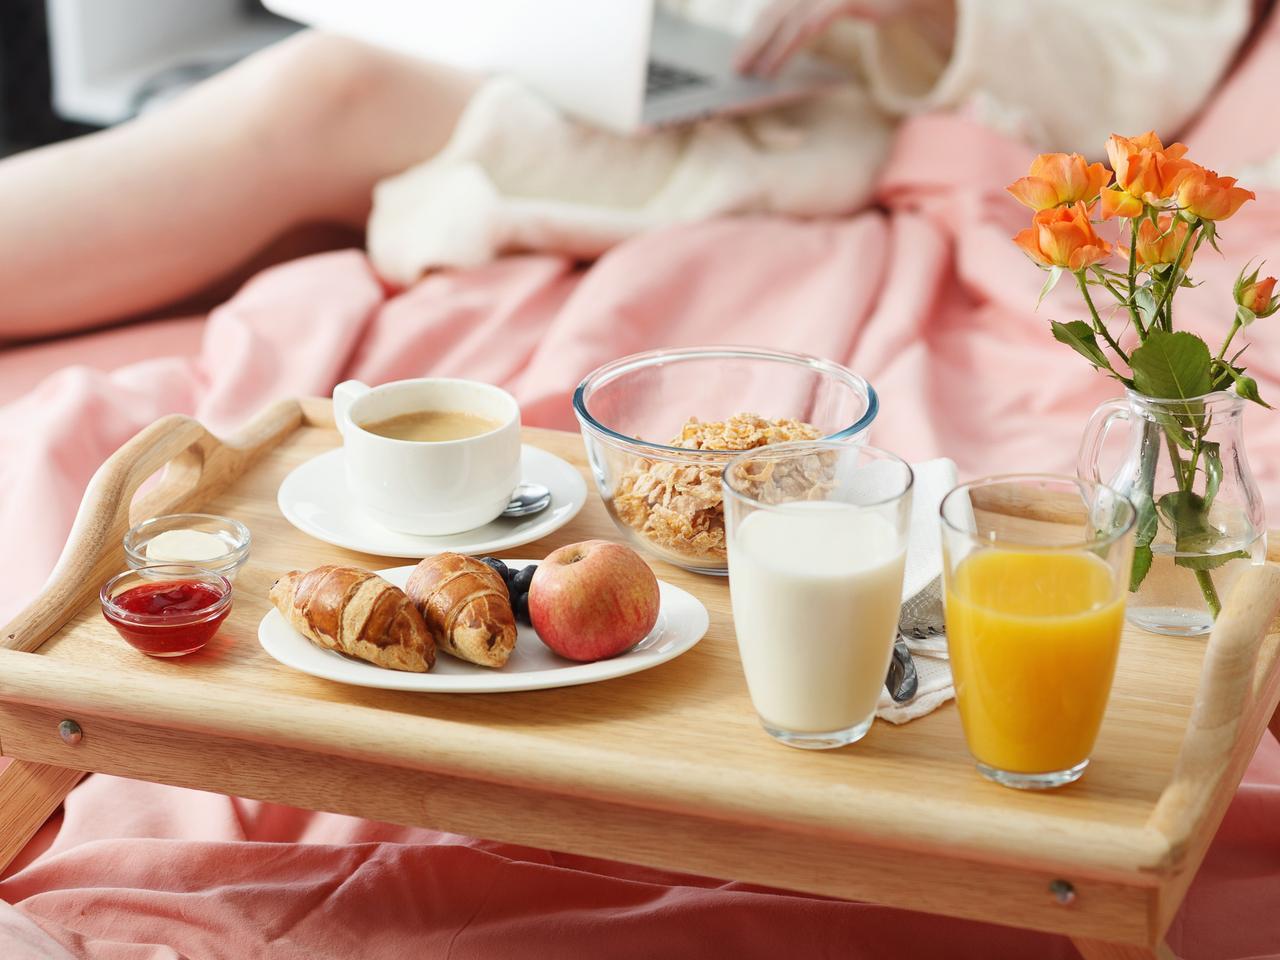 Breakfast served in bed